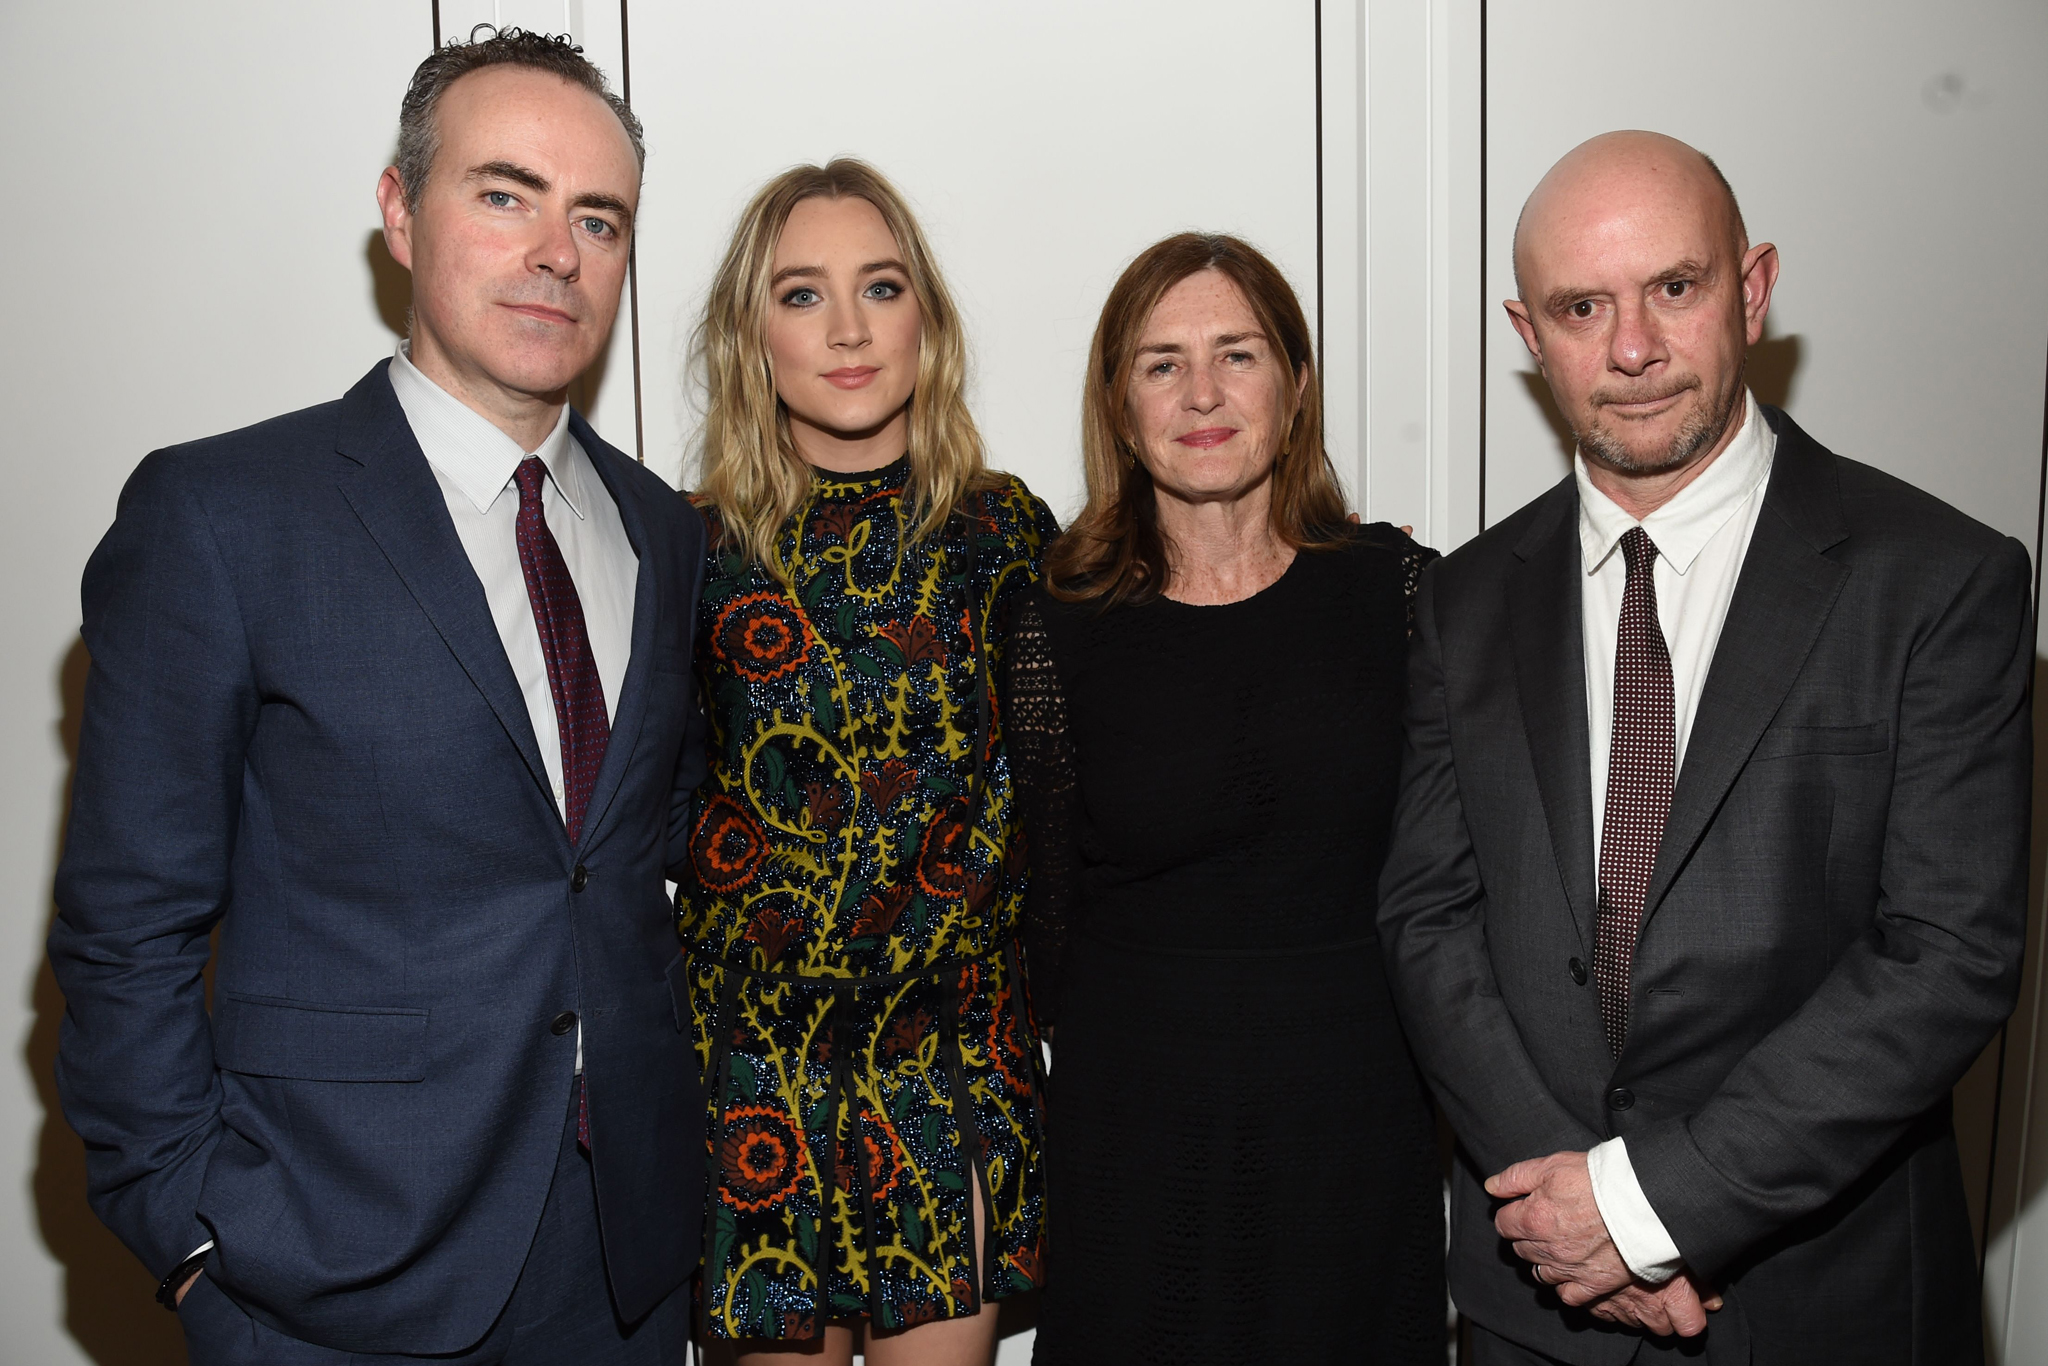 John Crowley, Saoirse Ronan, producer Finola Dwyer and writer Nick Hornby